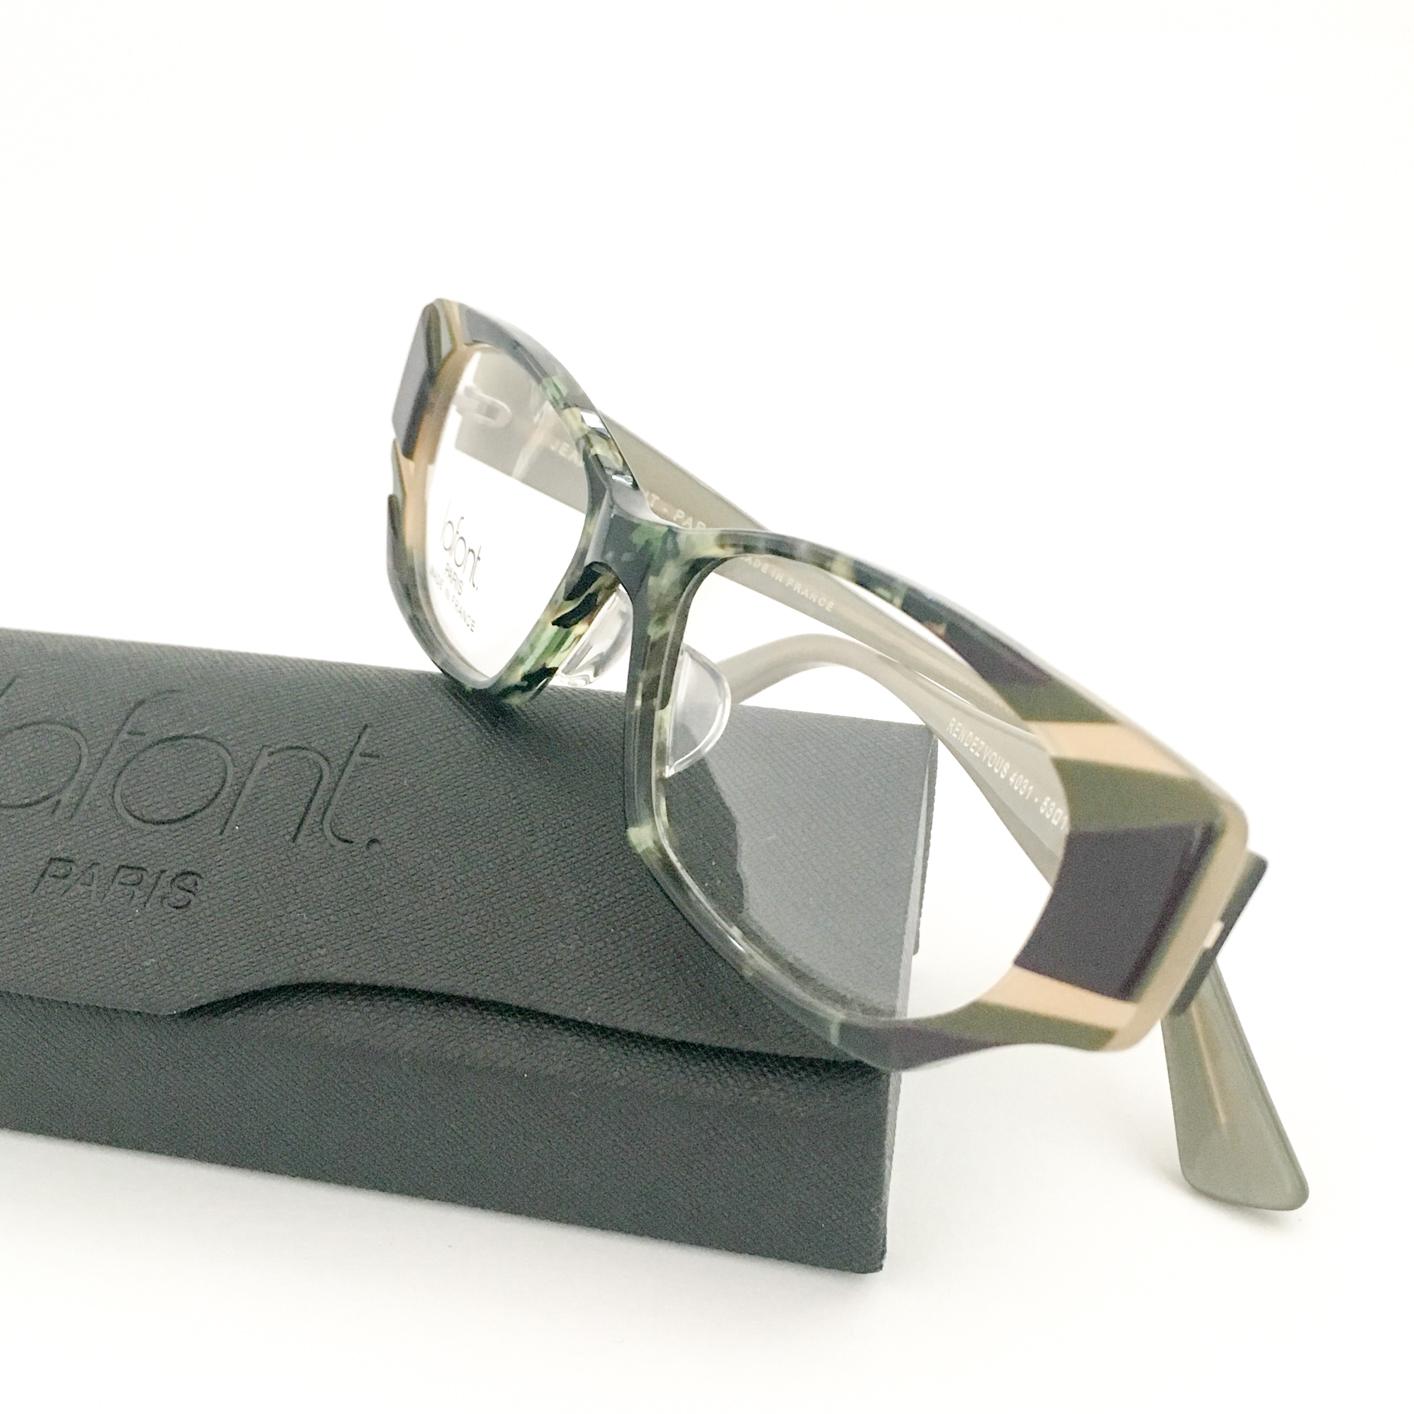 Lafont_ラフォン眼鏡フレーム_LAF-REND_4031